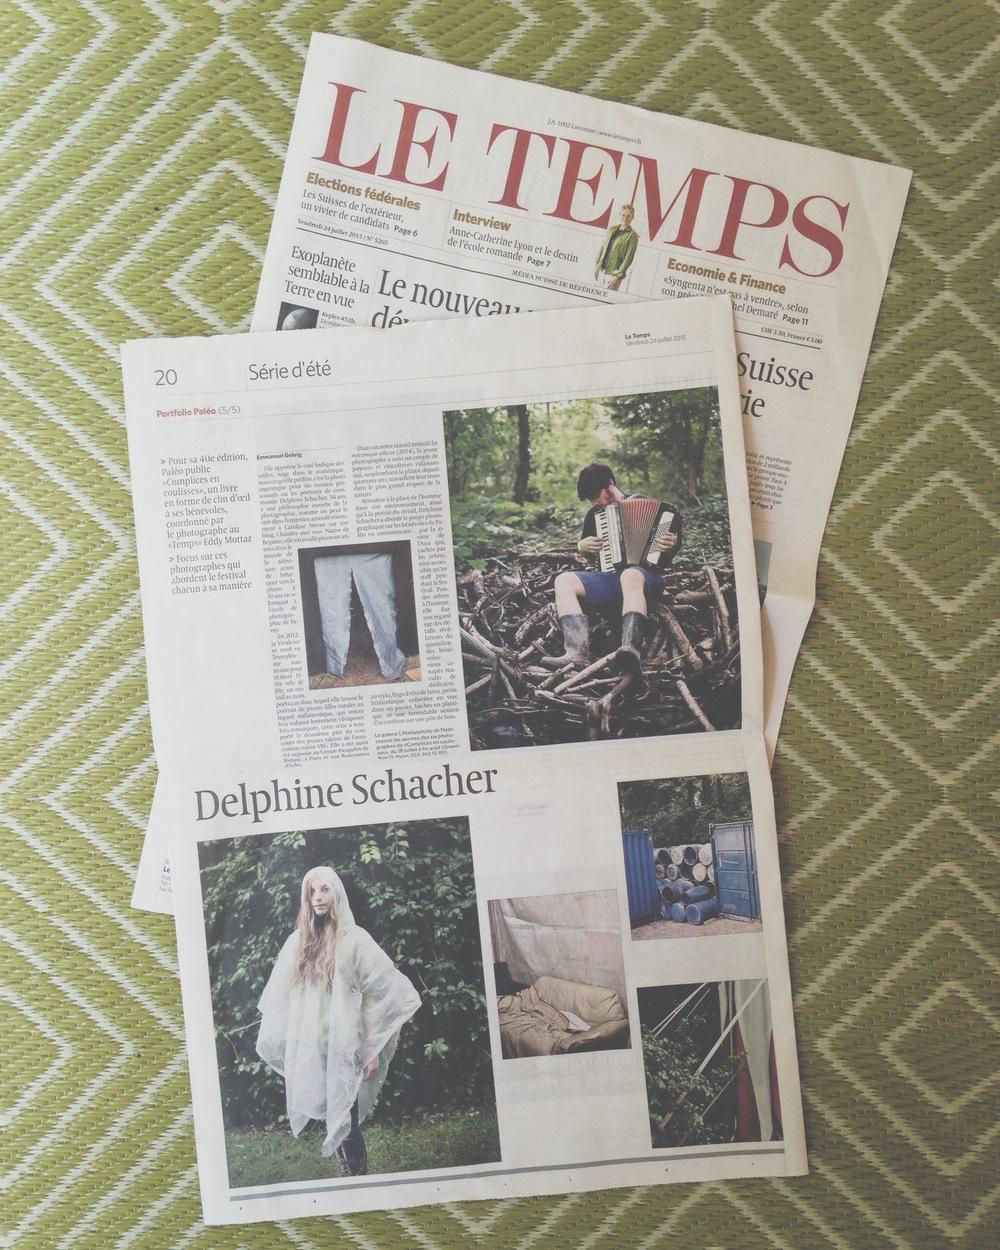 LE TEMPS, vendredi 24 juillet 2015, par Emmanuel Gehrig